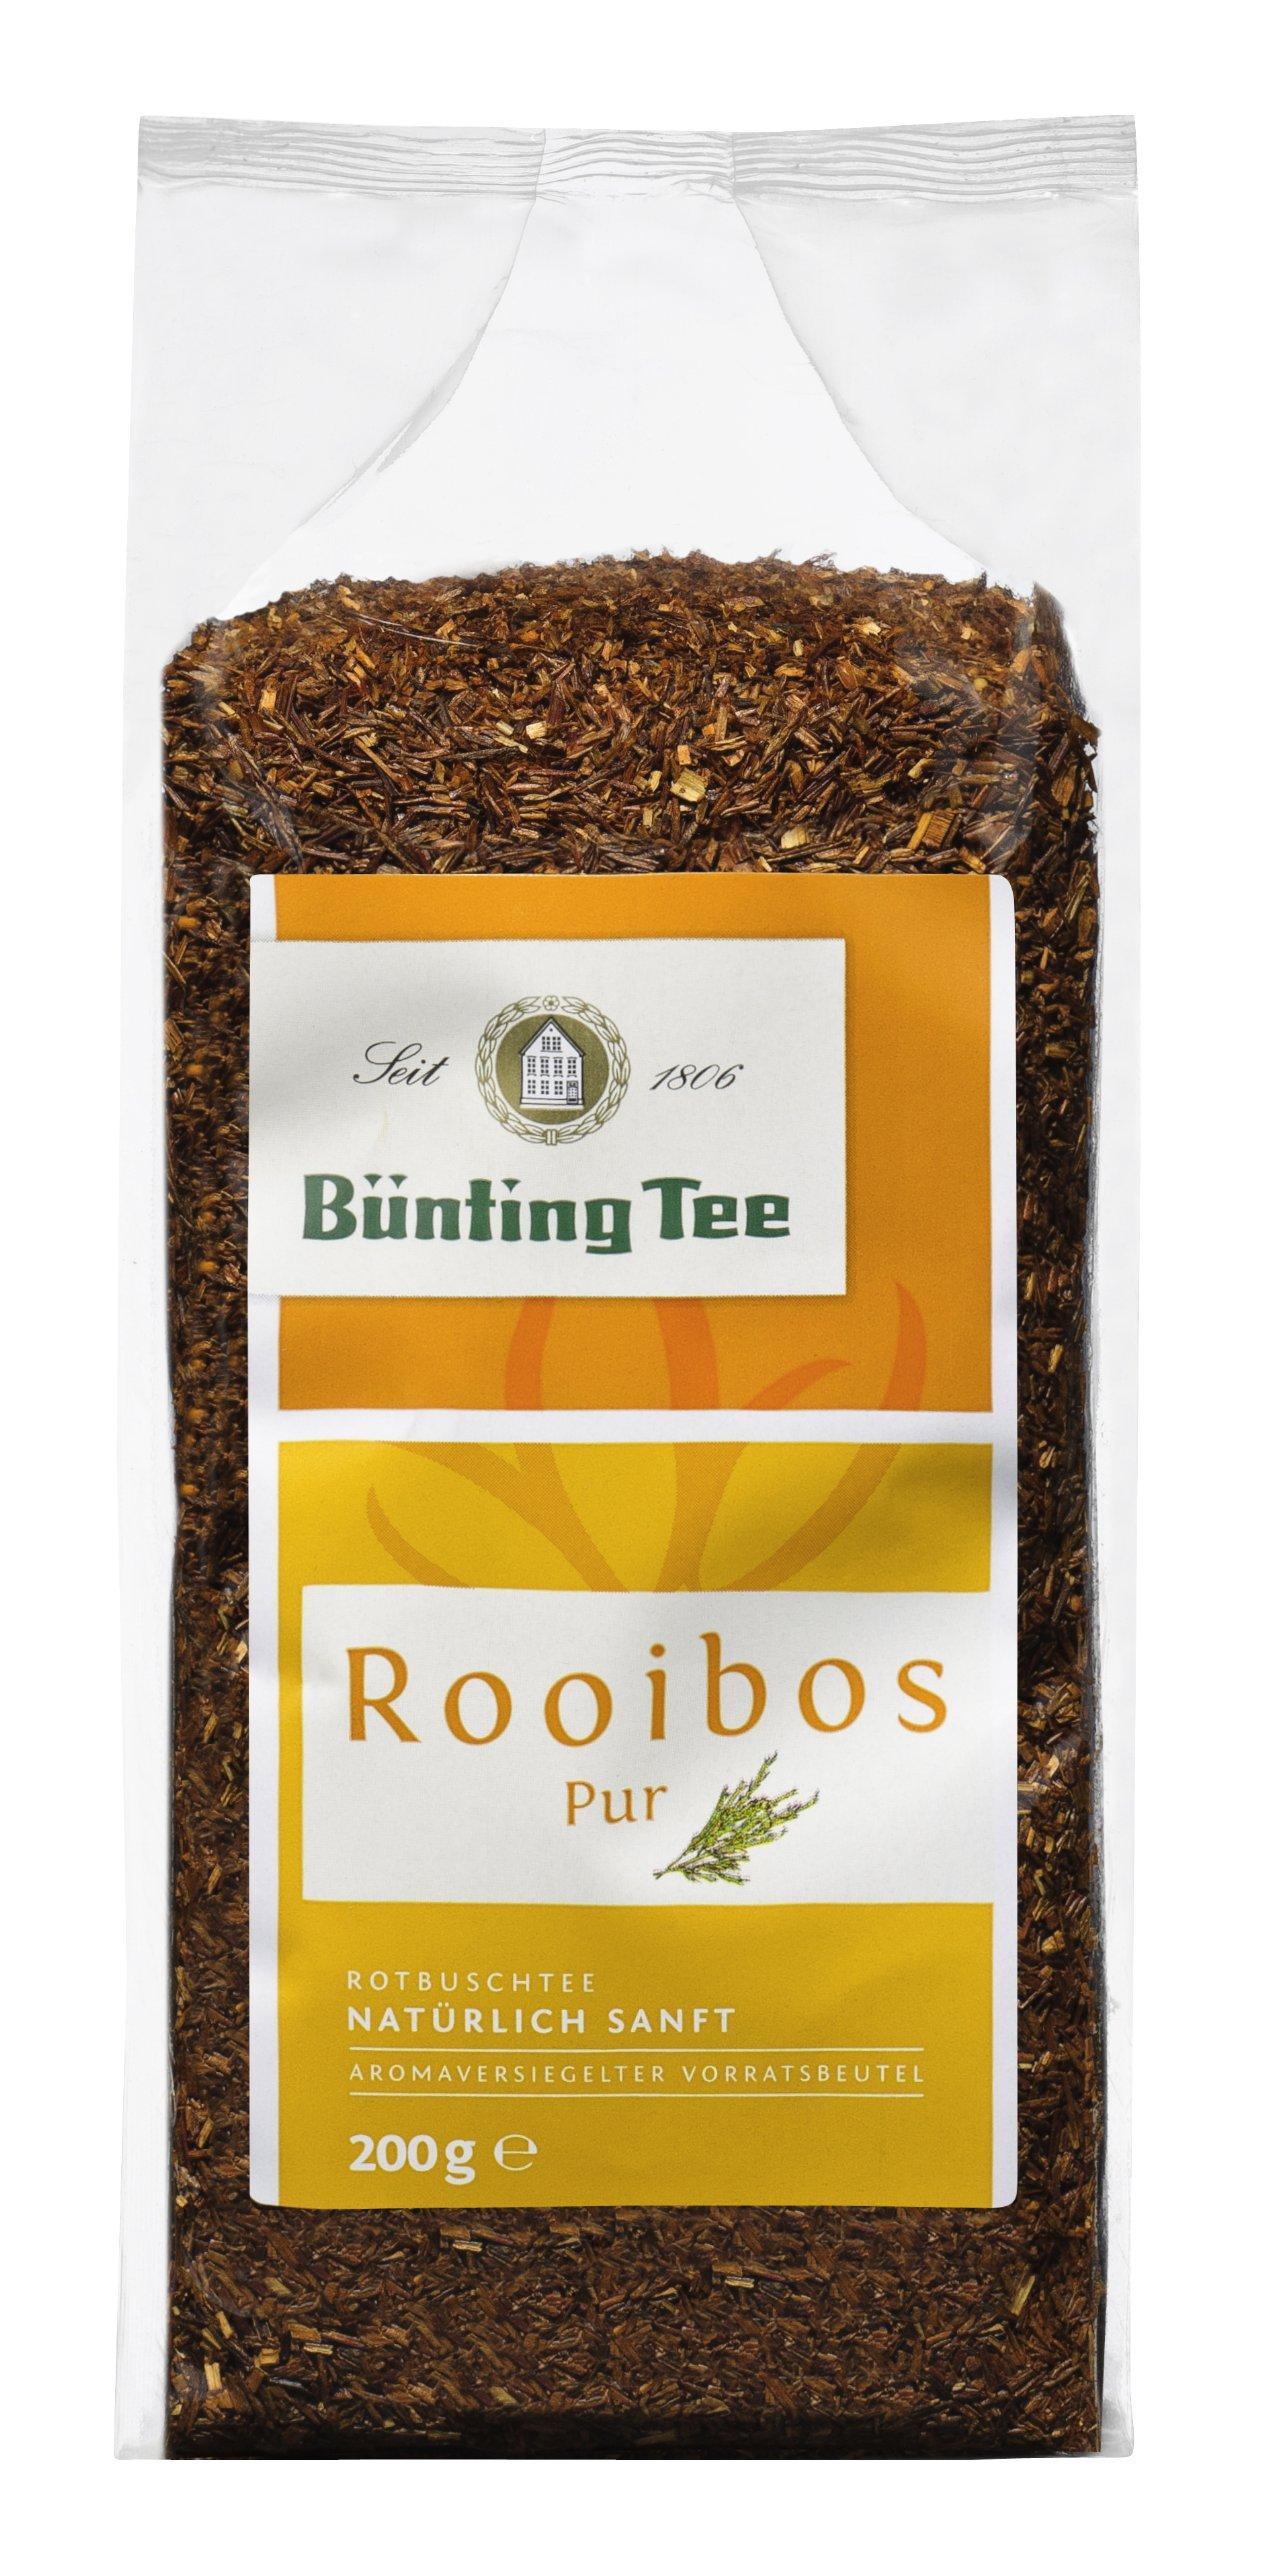 Bnting-Tee-Rooibos-Pur-200g